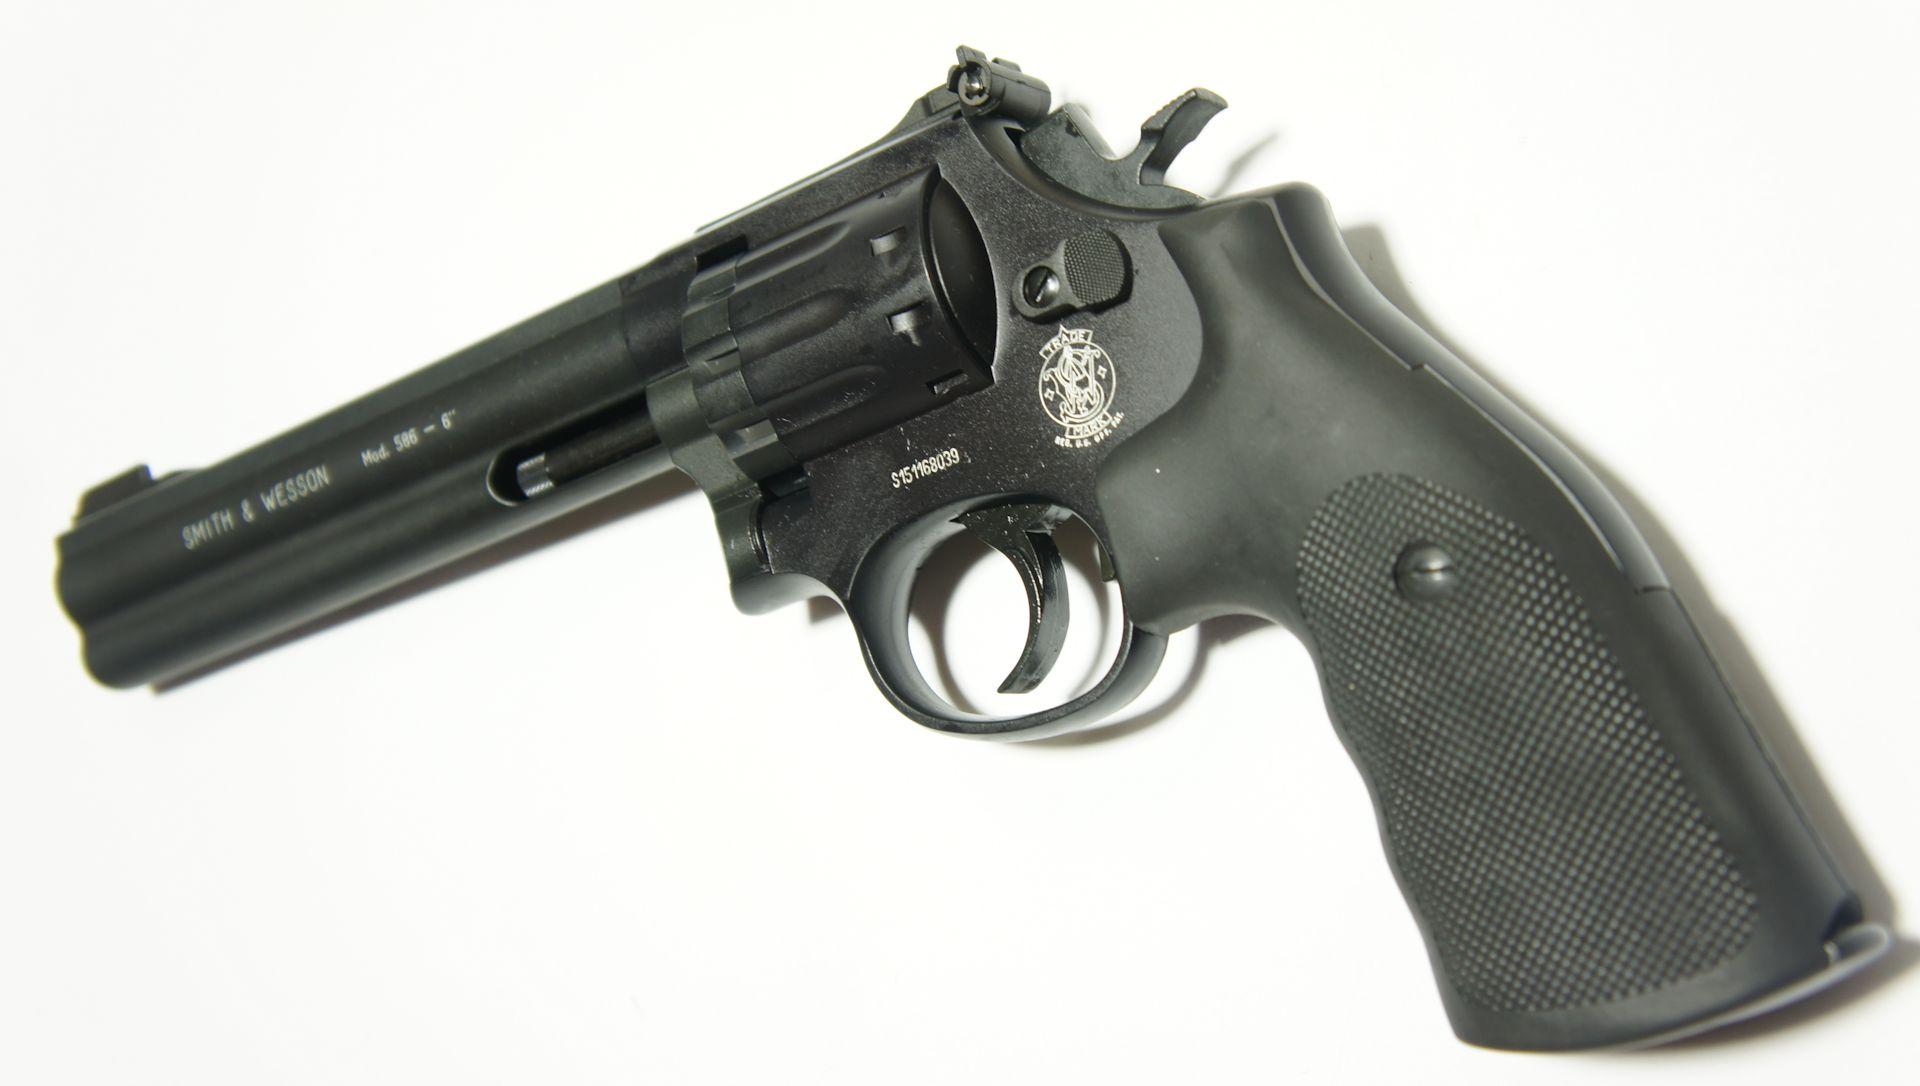 <a href=1050031.htm>So ein CO2 Revolver S&W 586</a> wäre die perfekte Ergänzung